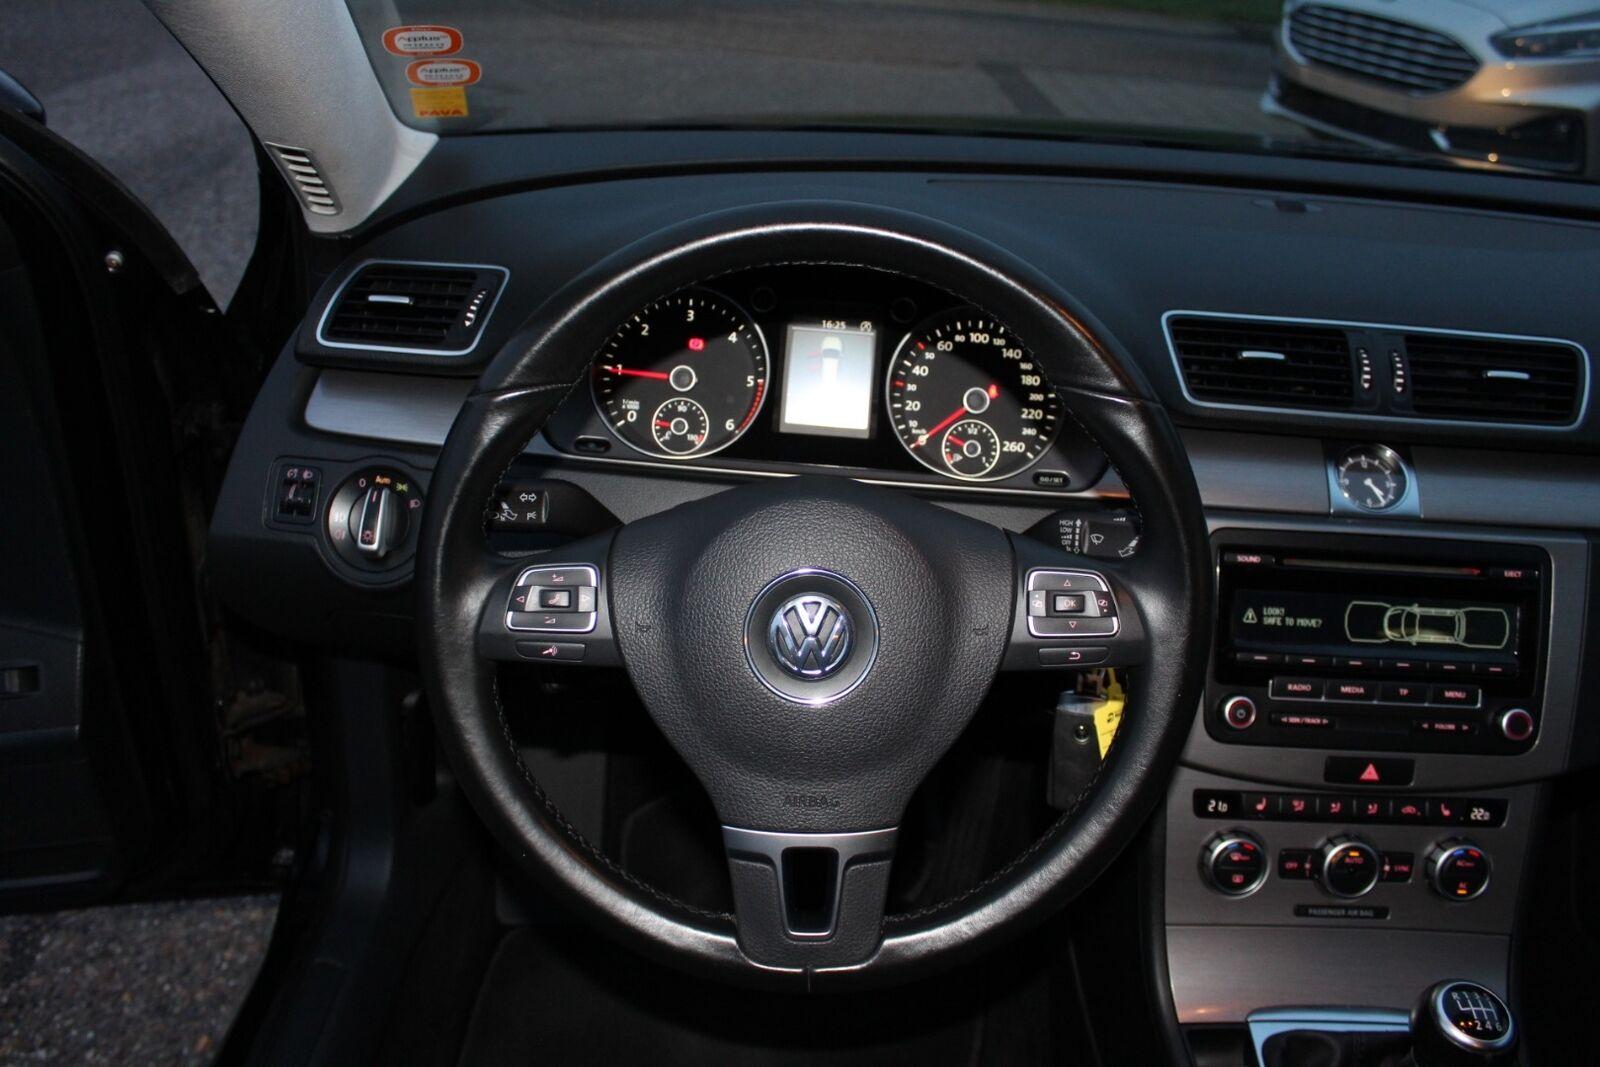 VW Passat 2,0 TDi 140 Comfortl. Vari. BMT - billede 9